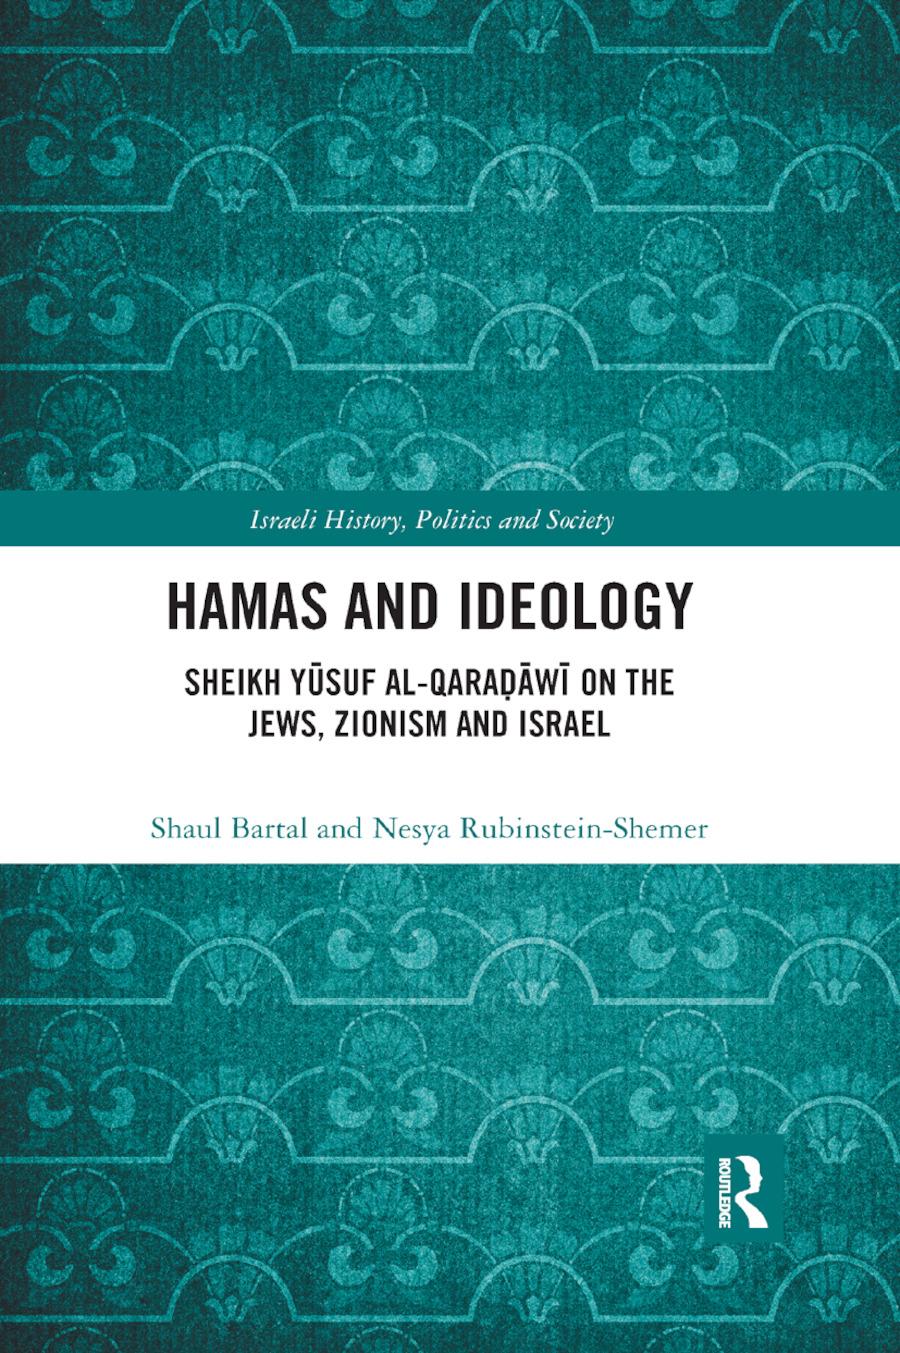 Hamas and Ideology